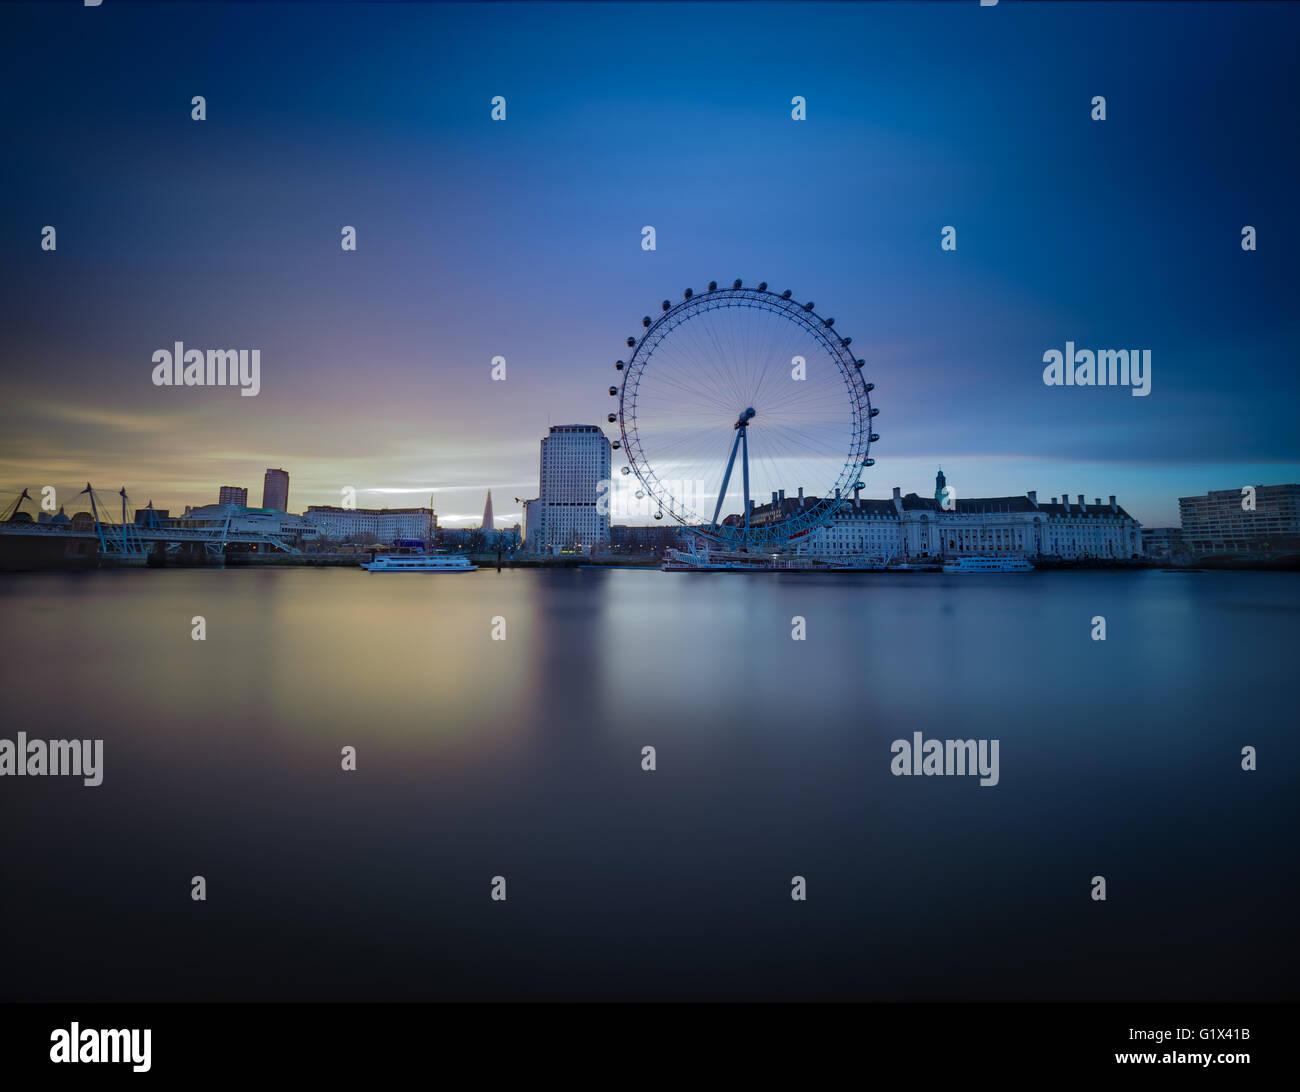 Goldene Stunde lange Exposition des London Eye in der Morgendämmerung. Stockbild